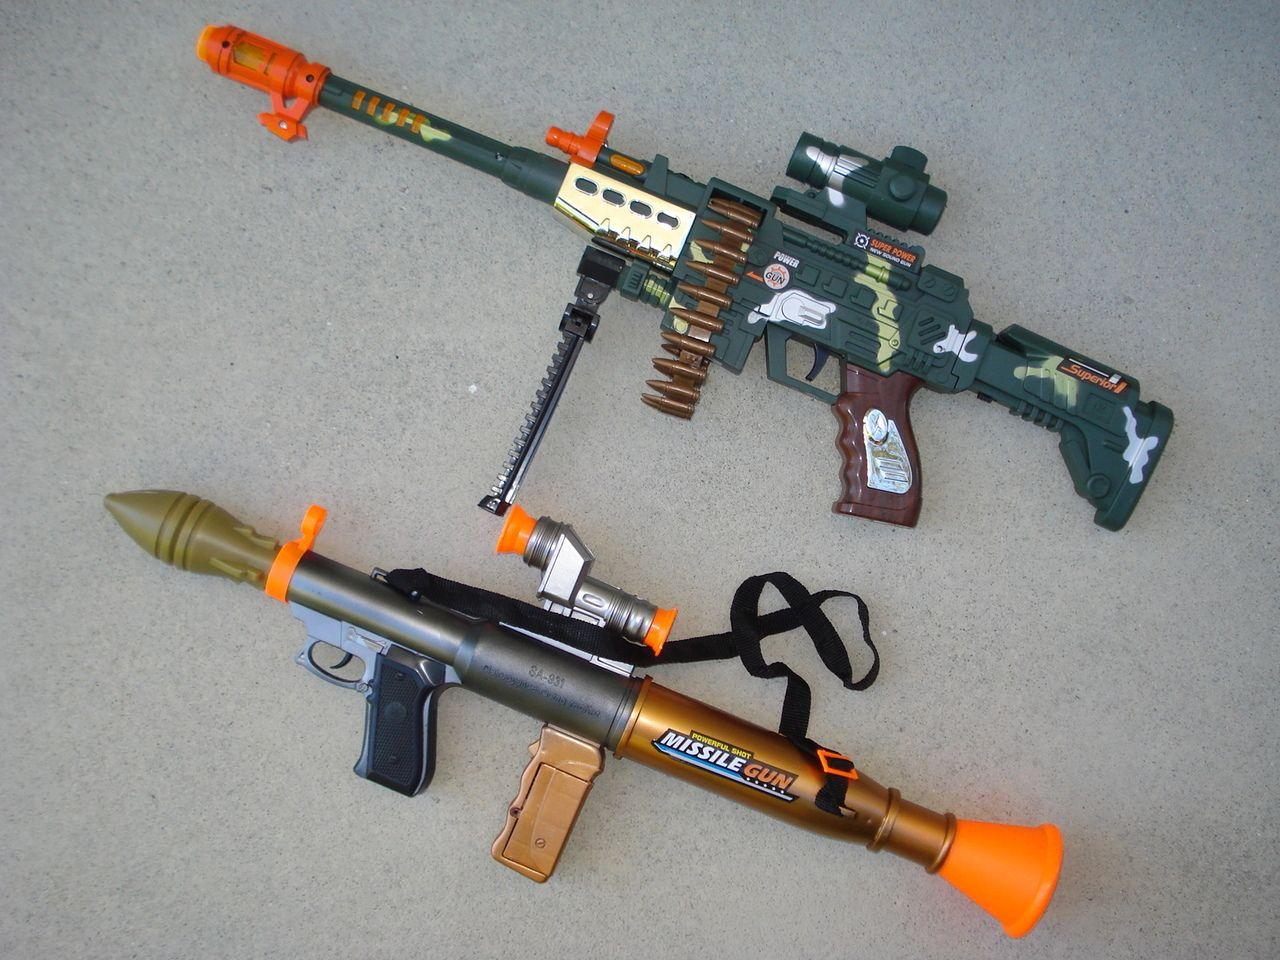 Baldheaded strong rocket artillery cannon toy can emit soft bullet bear  infested toy gun Bazooka 3-6-year-old boy